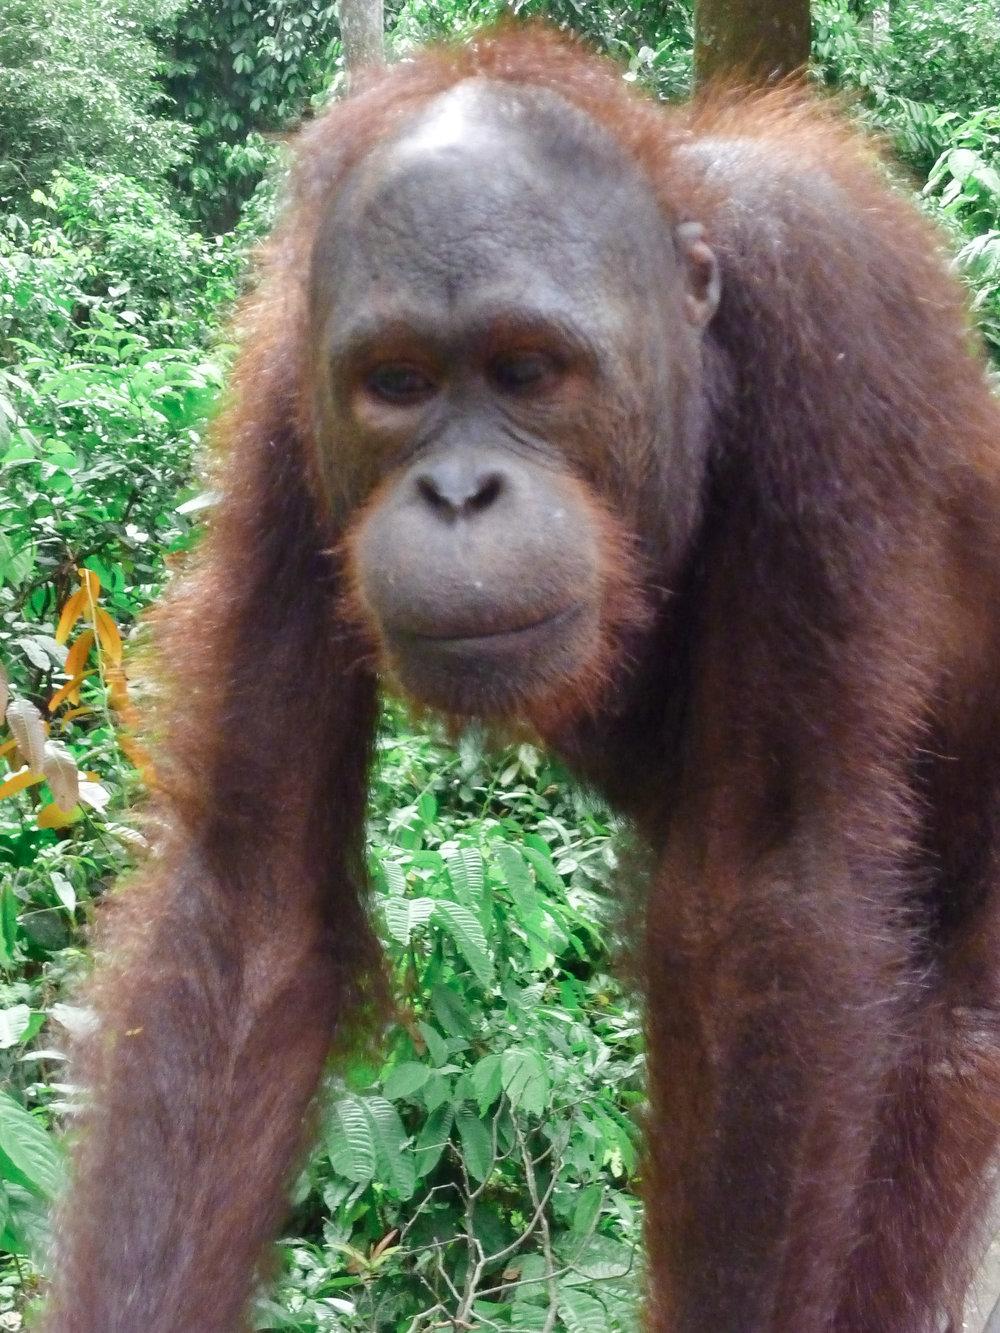 curio.trips.malaysia.borneo.orangutan.walking.portrait.jpg